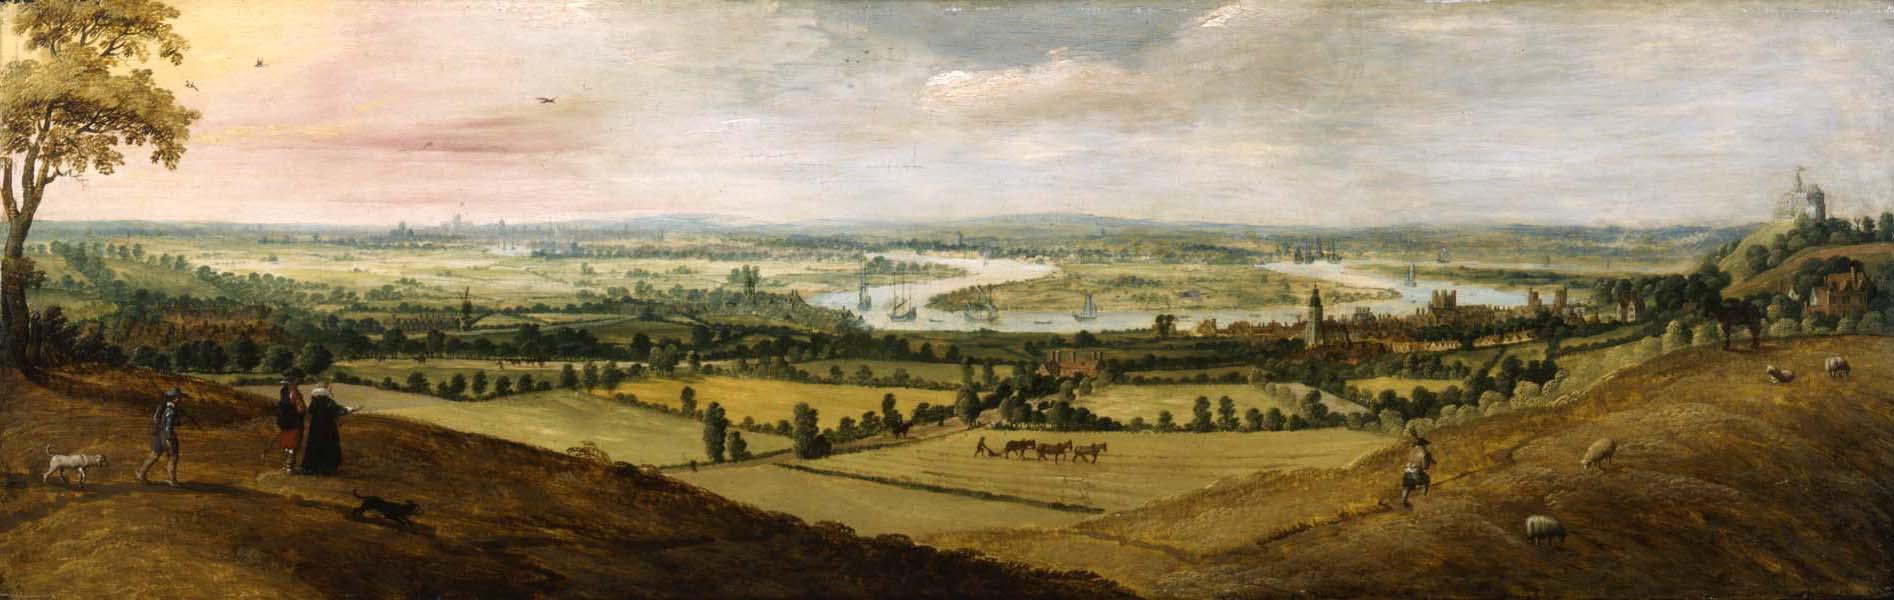 Battle of Blackheath - The 4th Kingdom of Britain 1